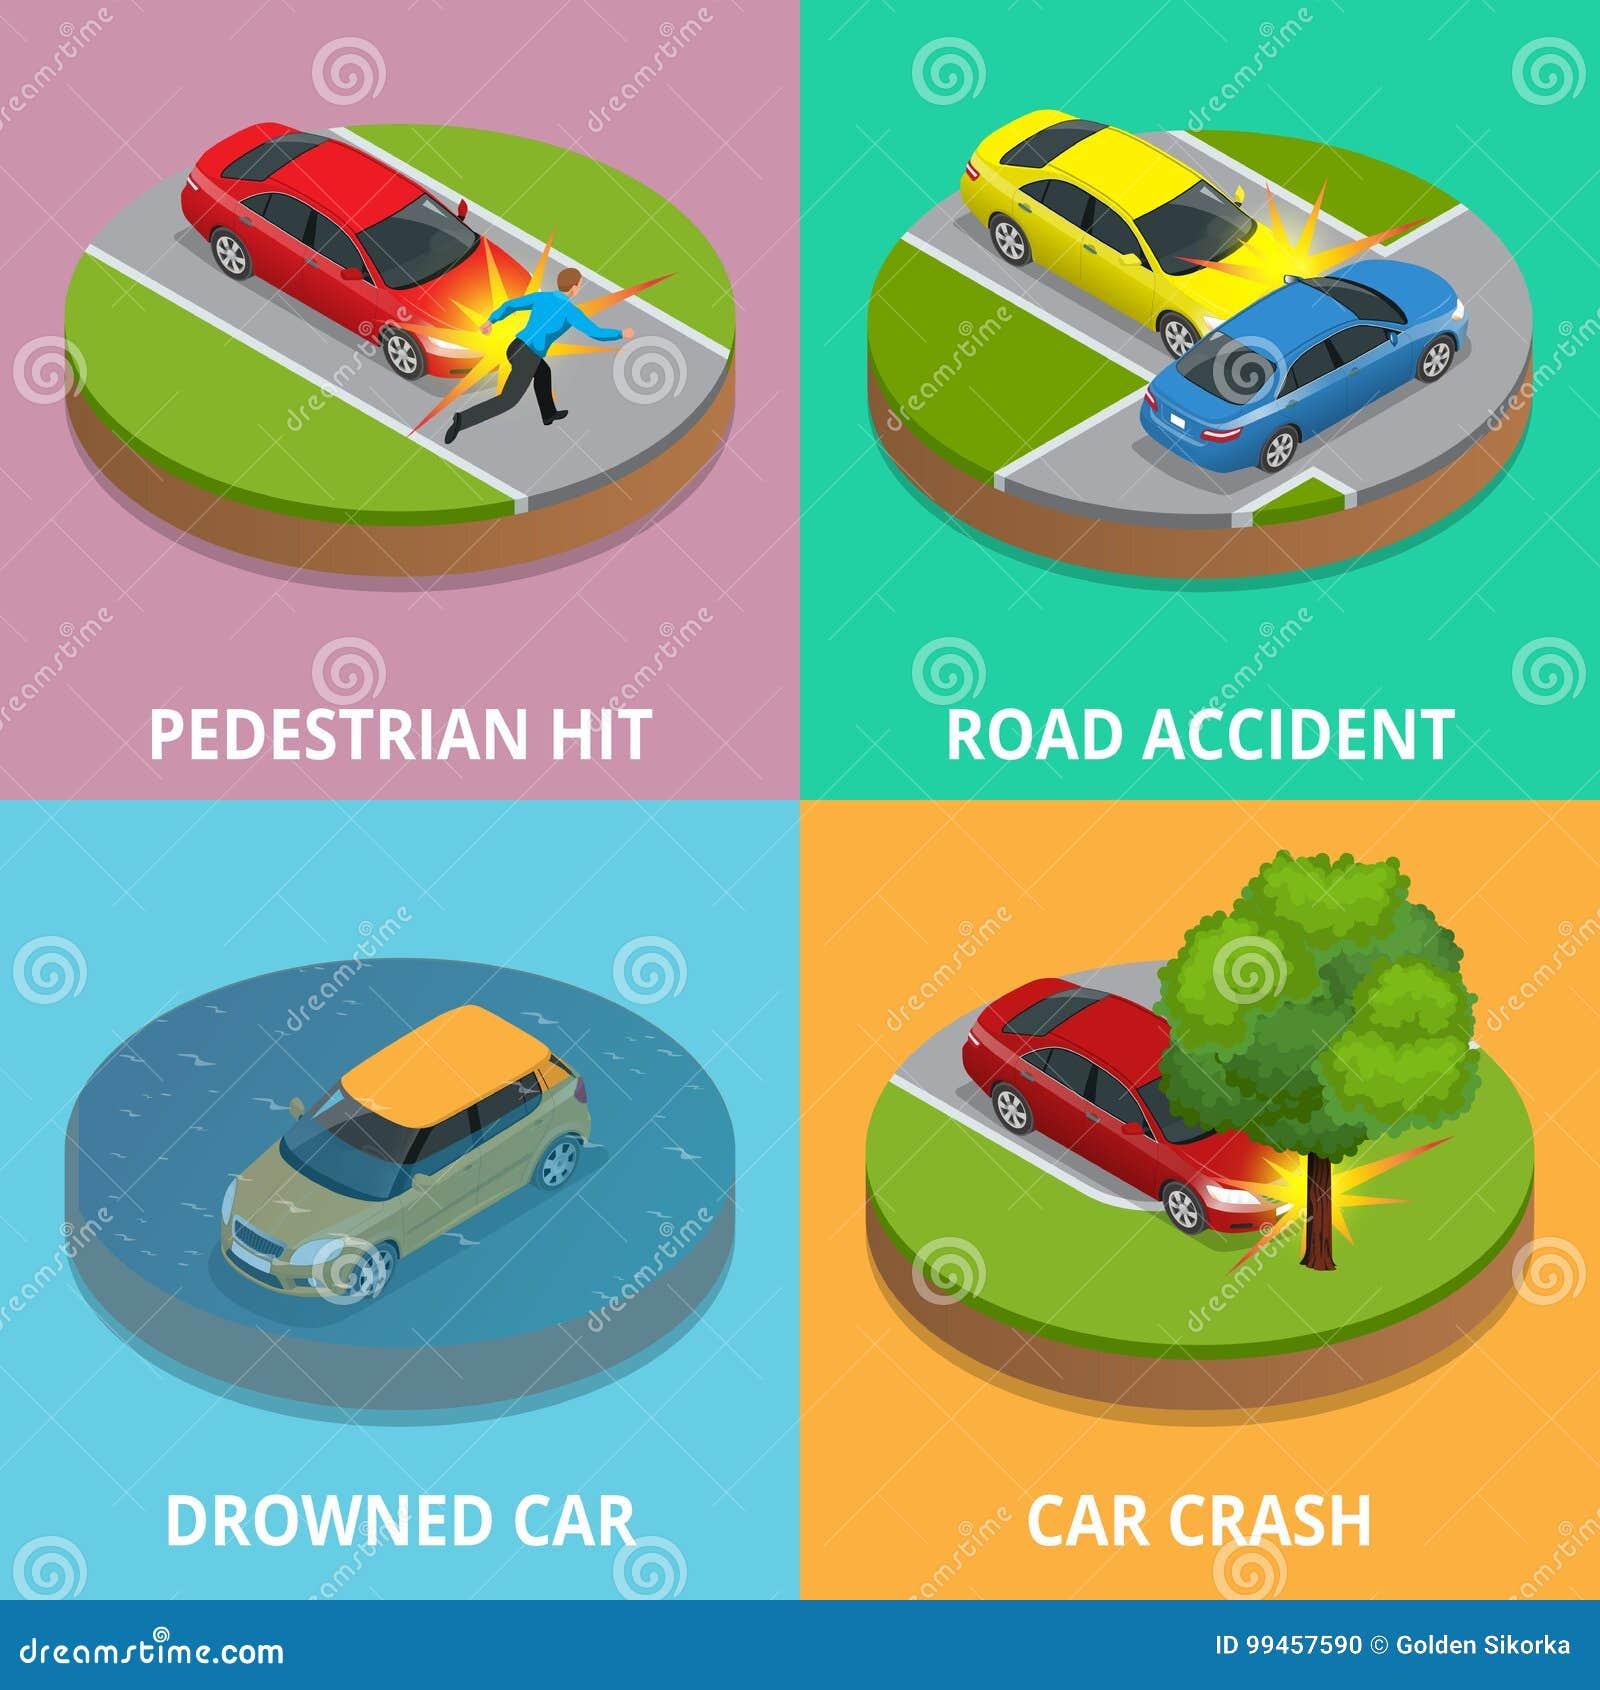 Isometric για τους πεζούς χτύπημα, τροχαίο ατύχημα, πνιμμένο αυτοκίνητο και έννοια τροχαίου ατυχήματος